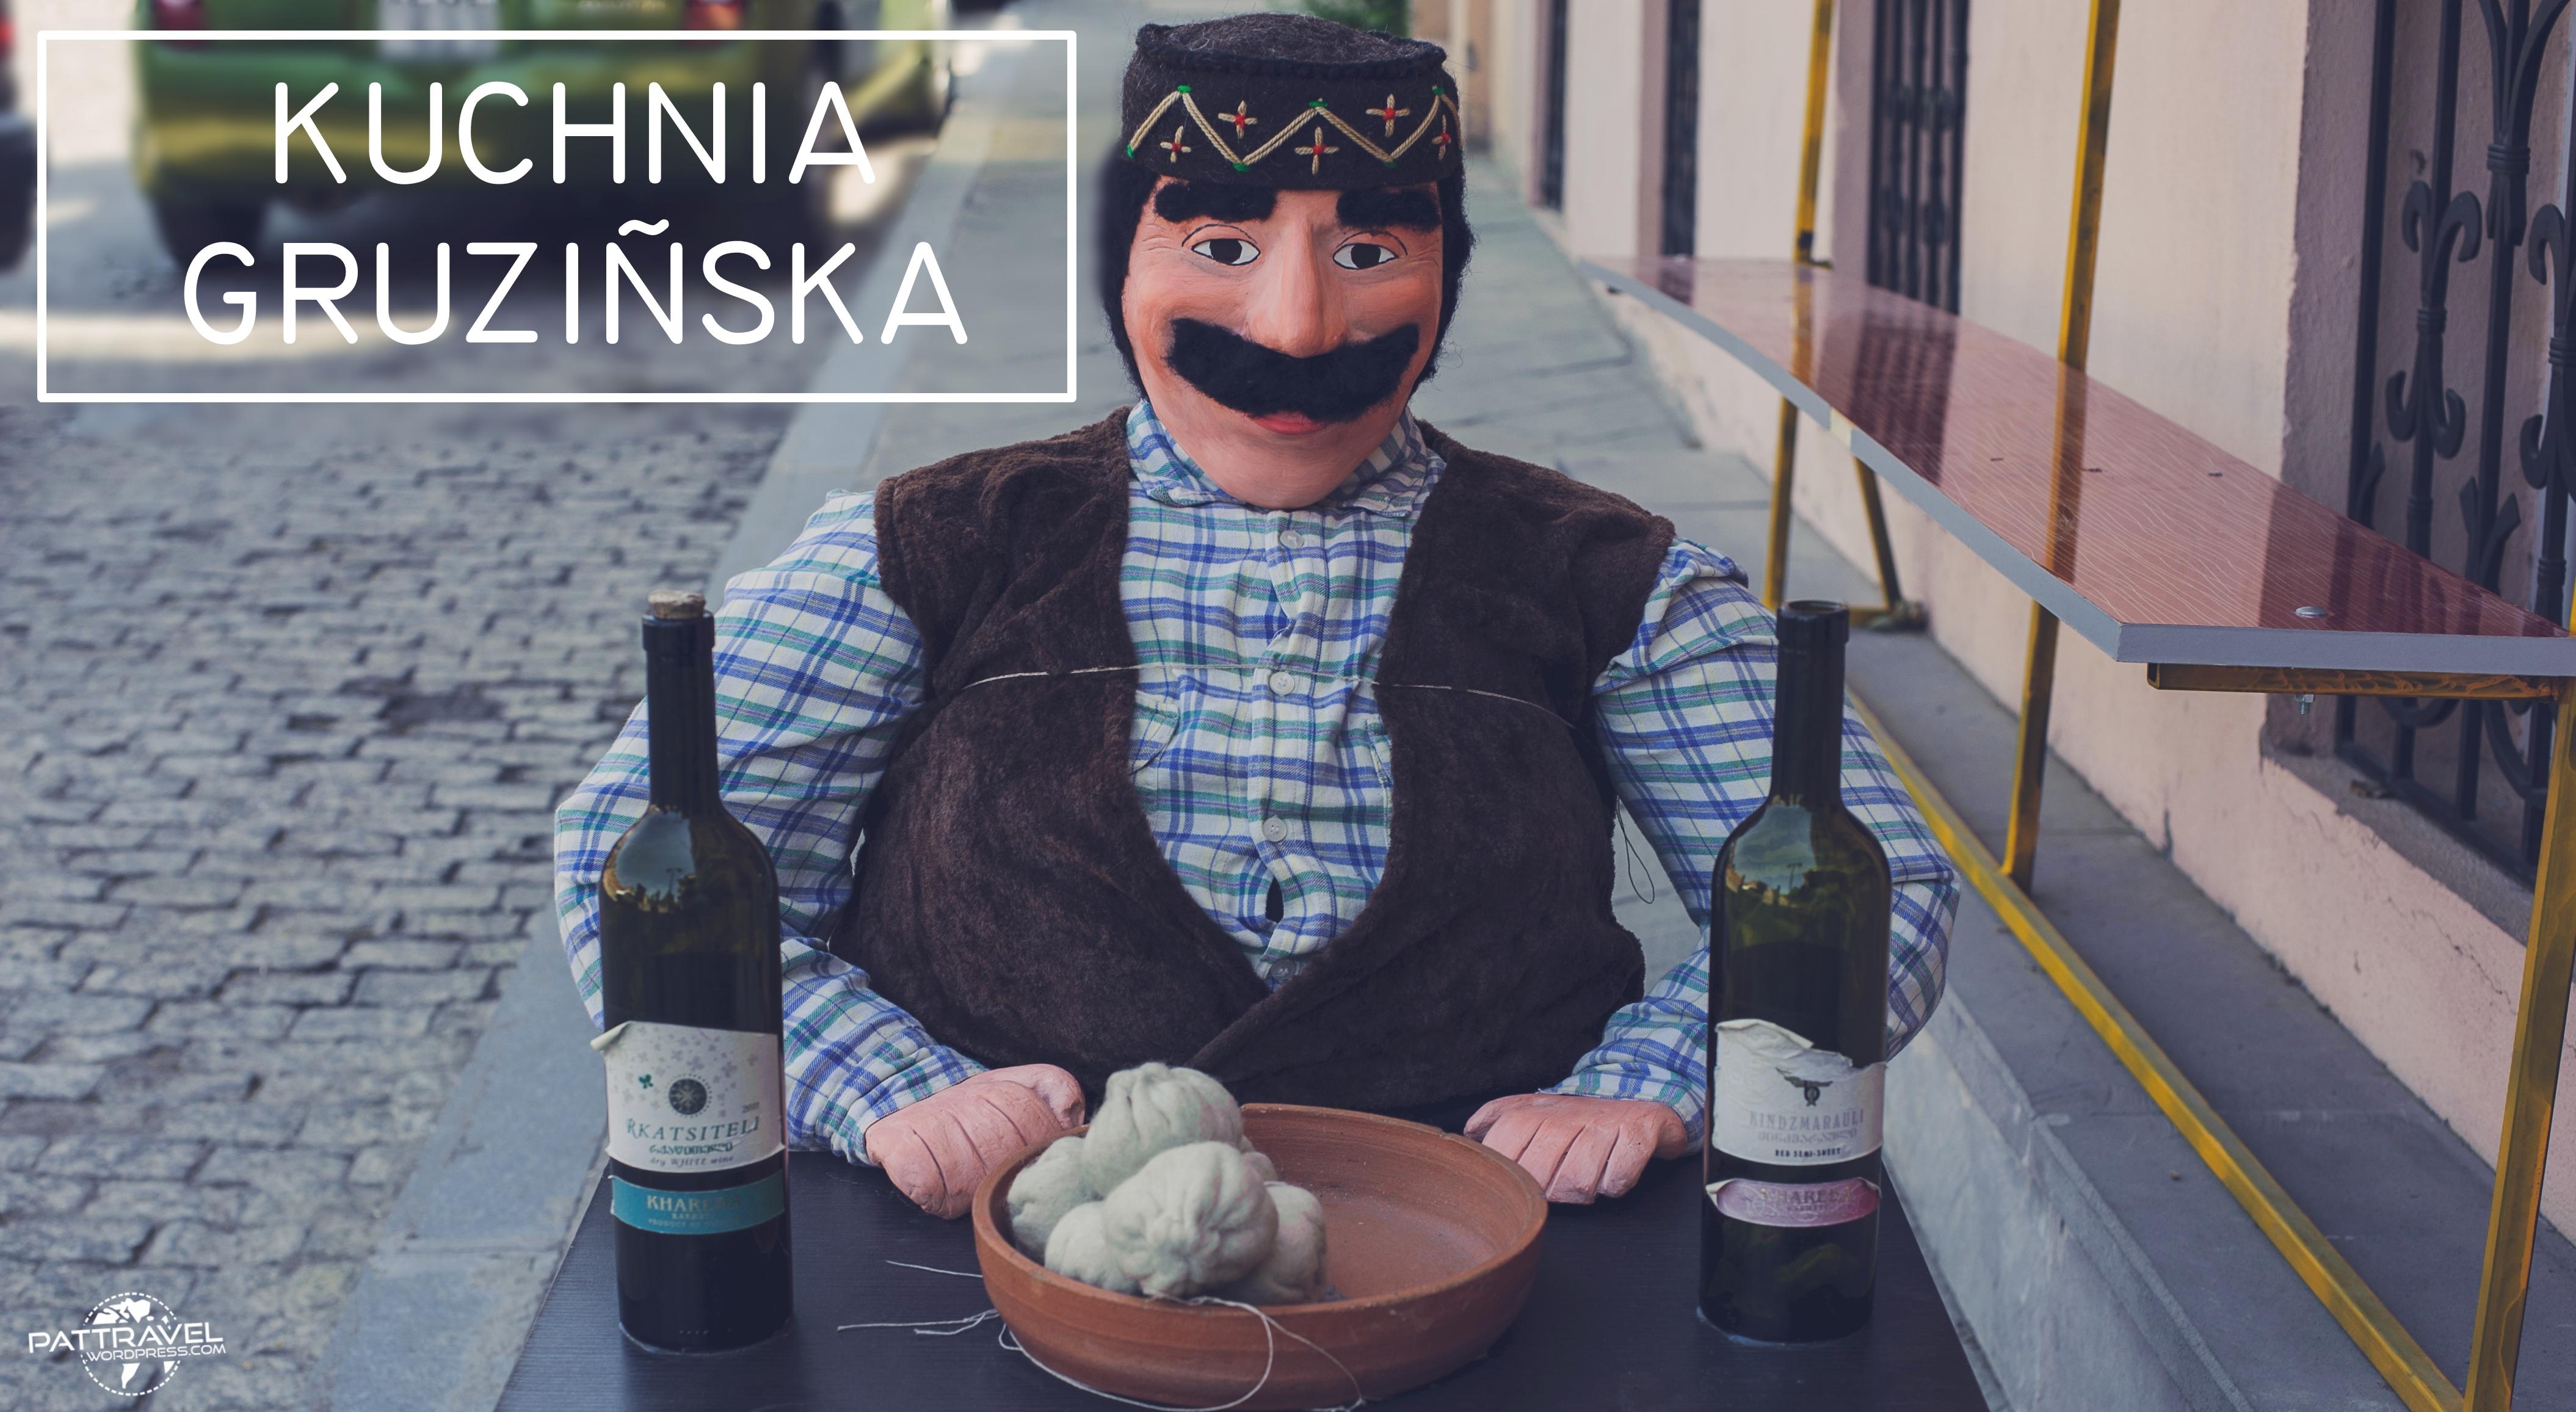 pattravel_kuchnia gruzinska